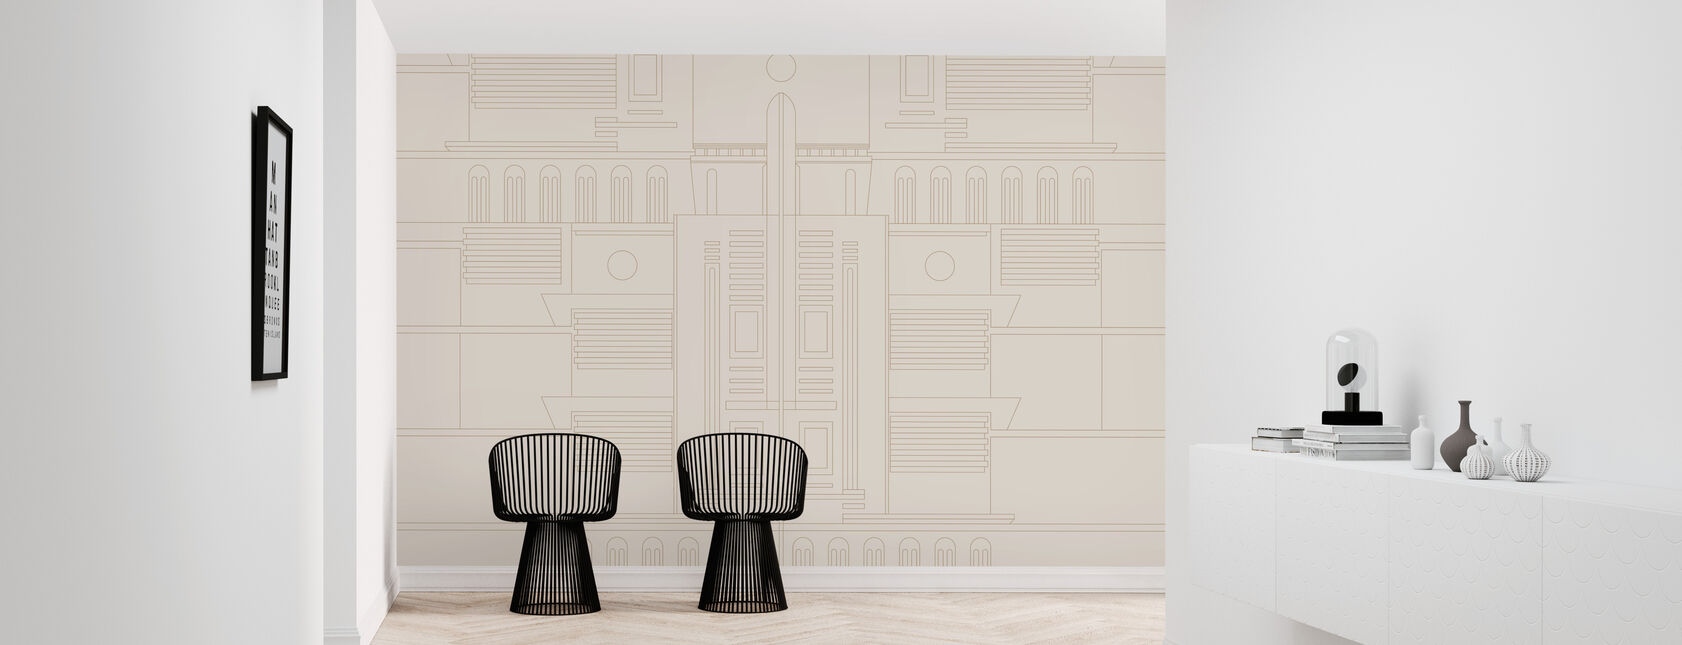 Deco - 04 - Wallpaper - Hallway